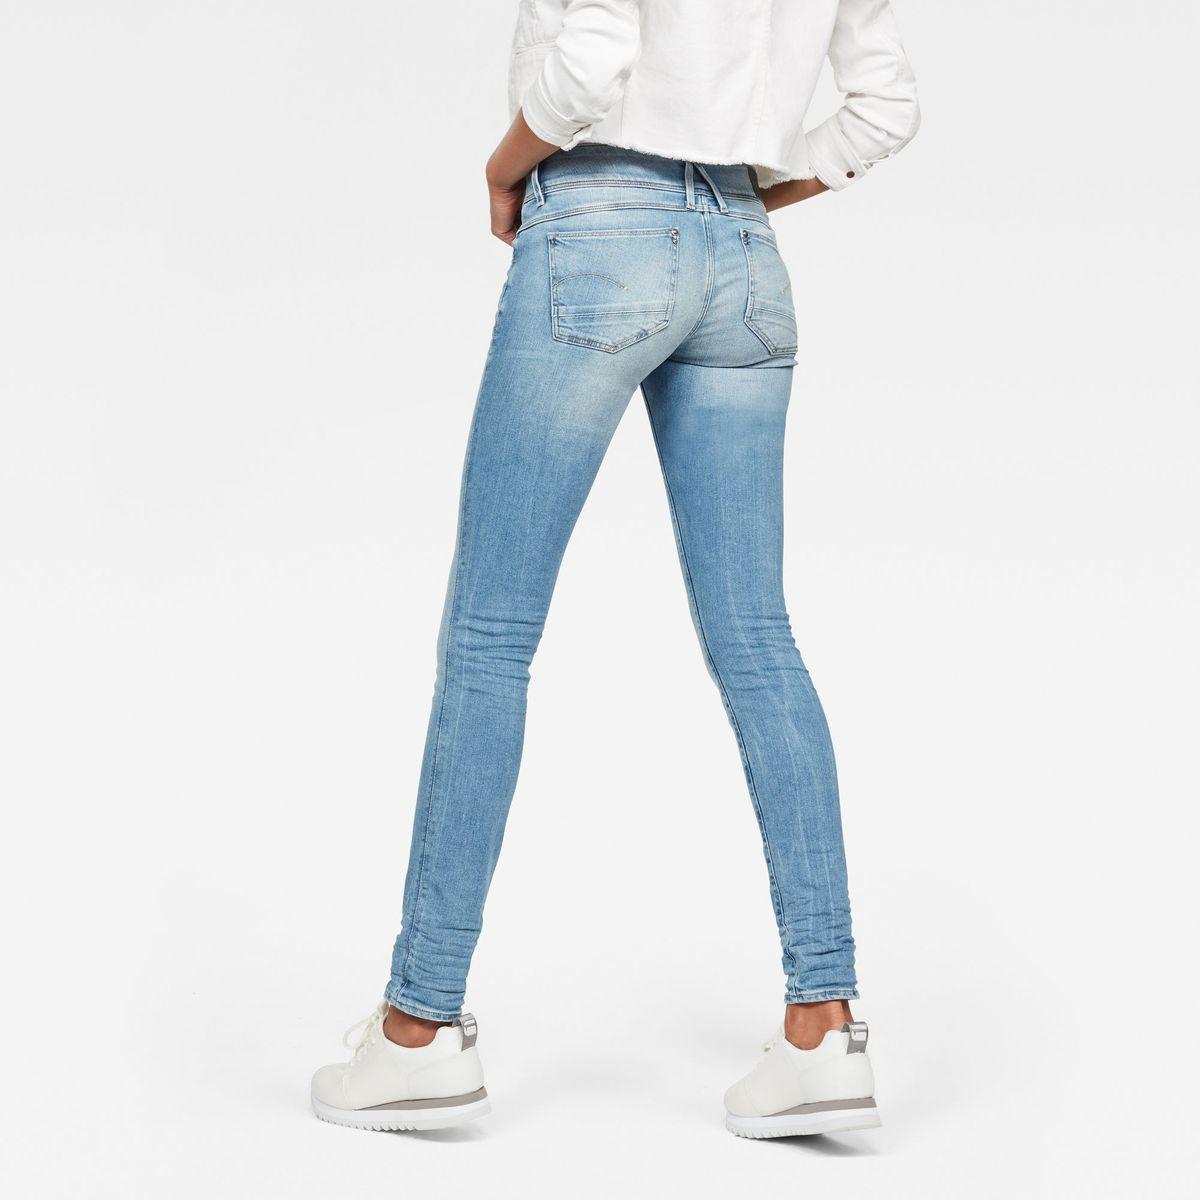 Jean Skinny Taille Moyenne Lynn Taille : W24L34;W25L32